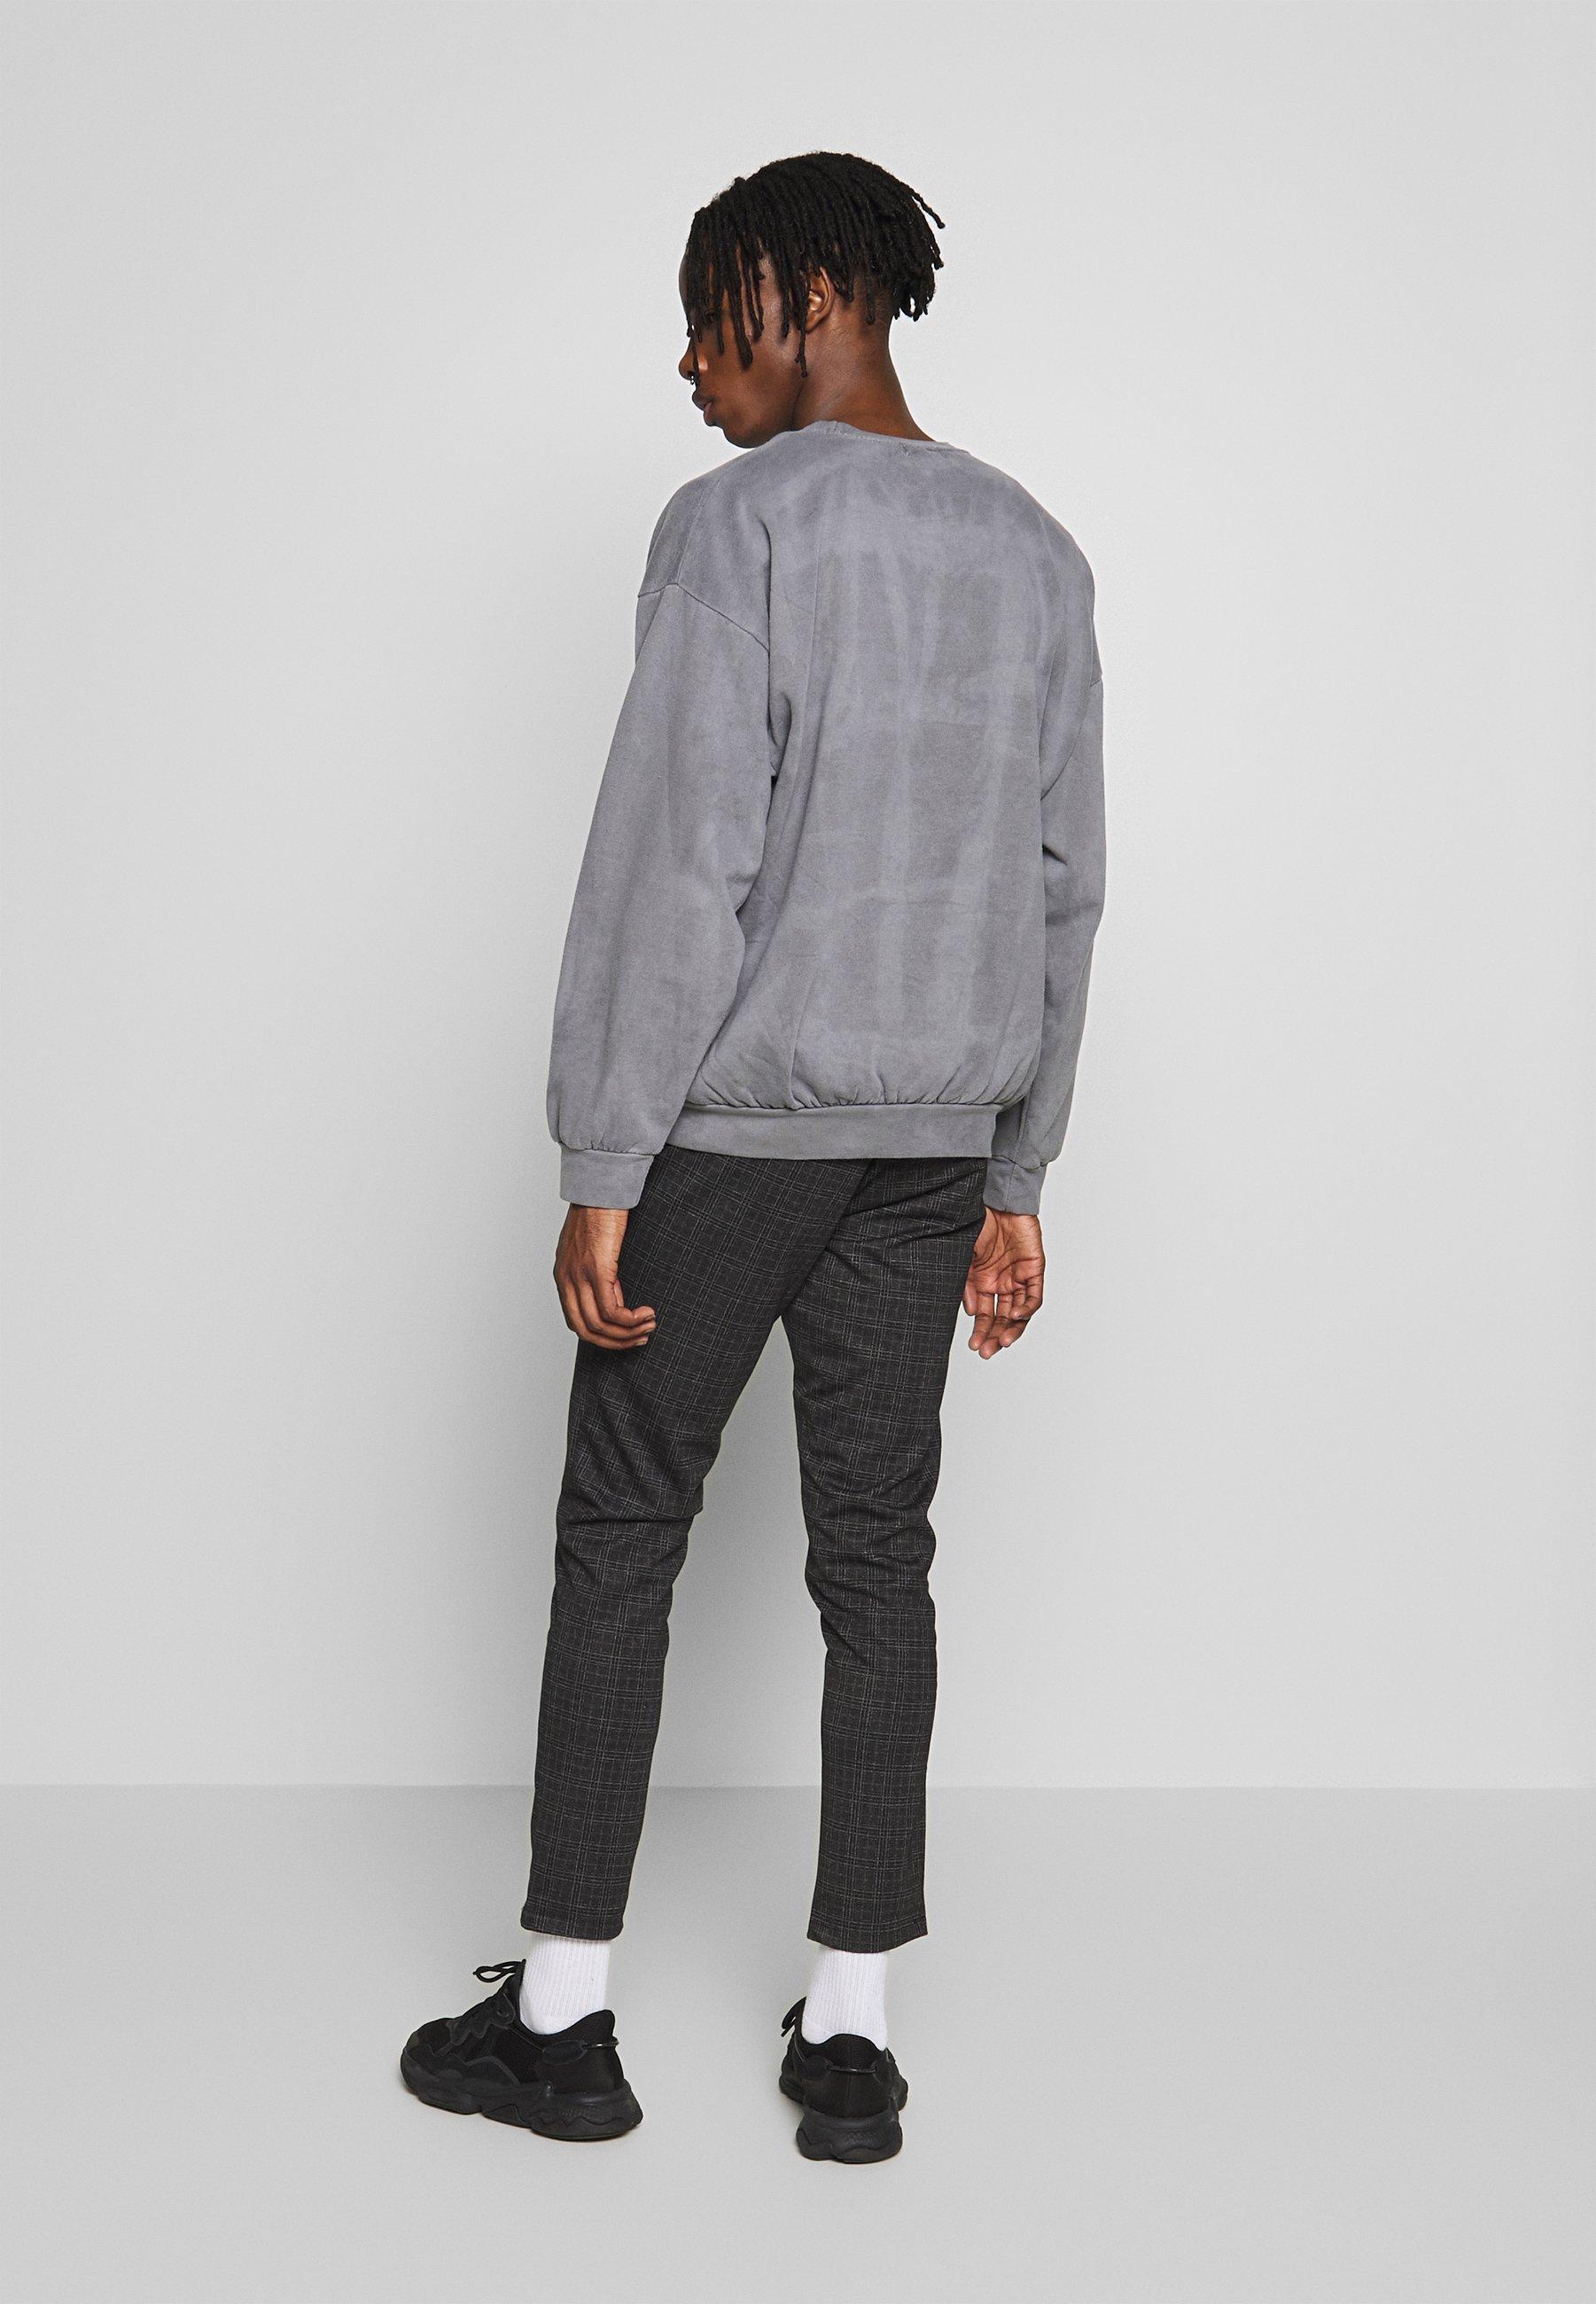 Topman Black Washed Berlin - Sweatshirts Grey